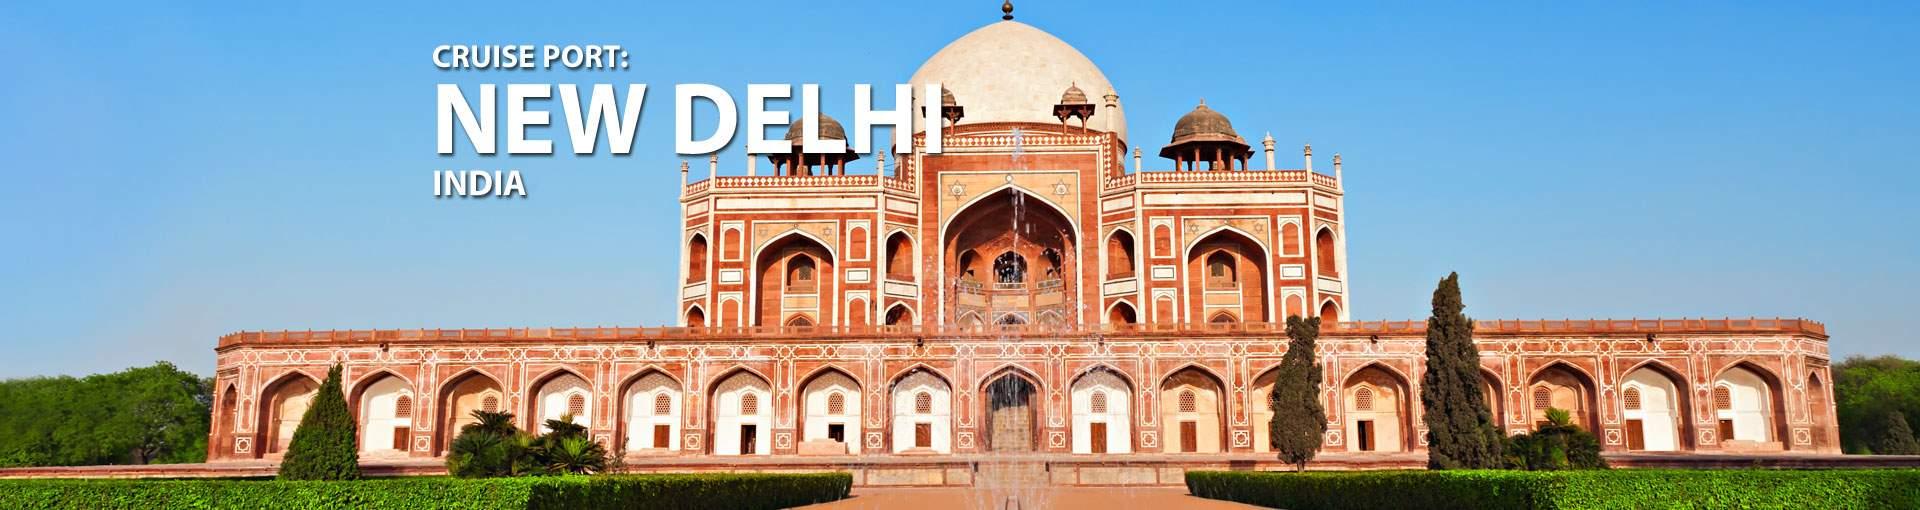 Cruises to New Delhi, India